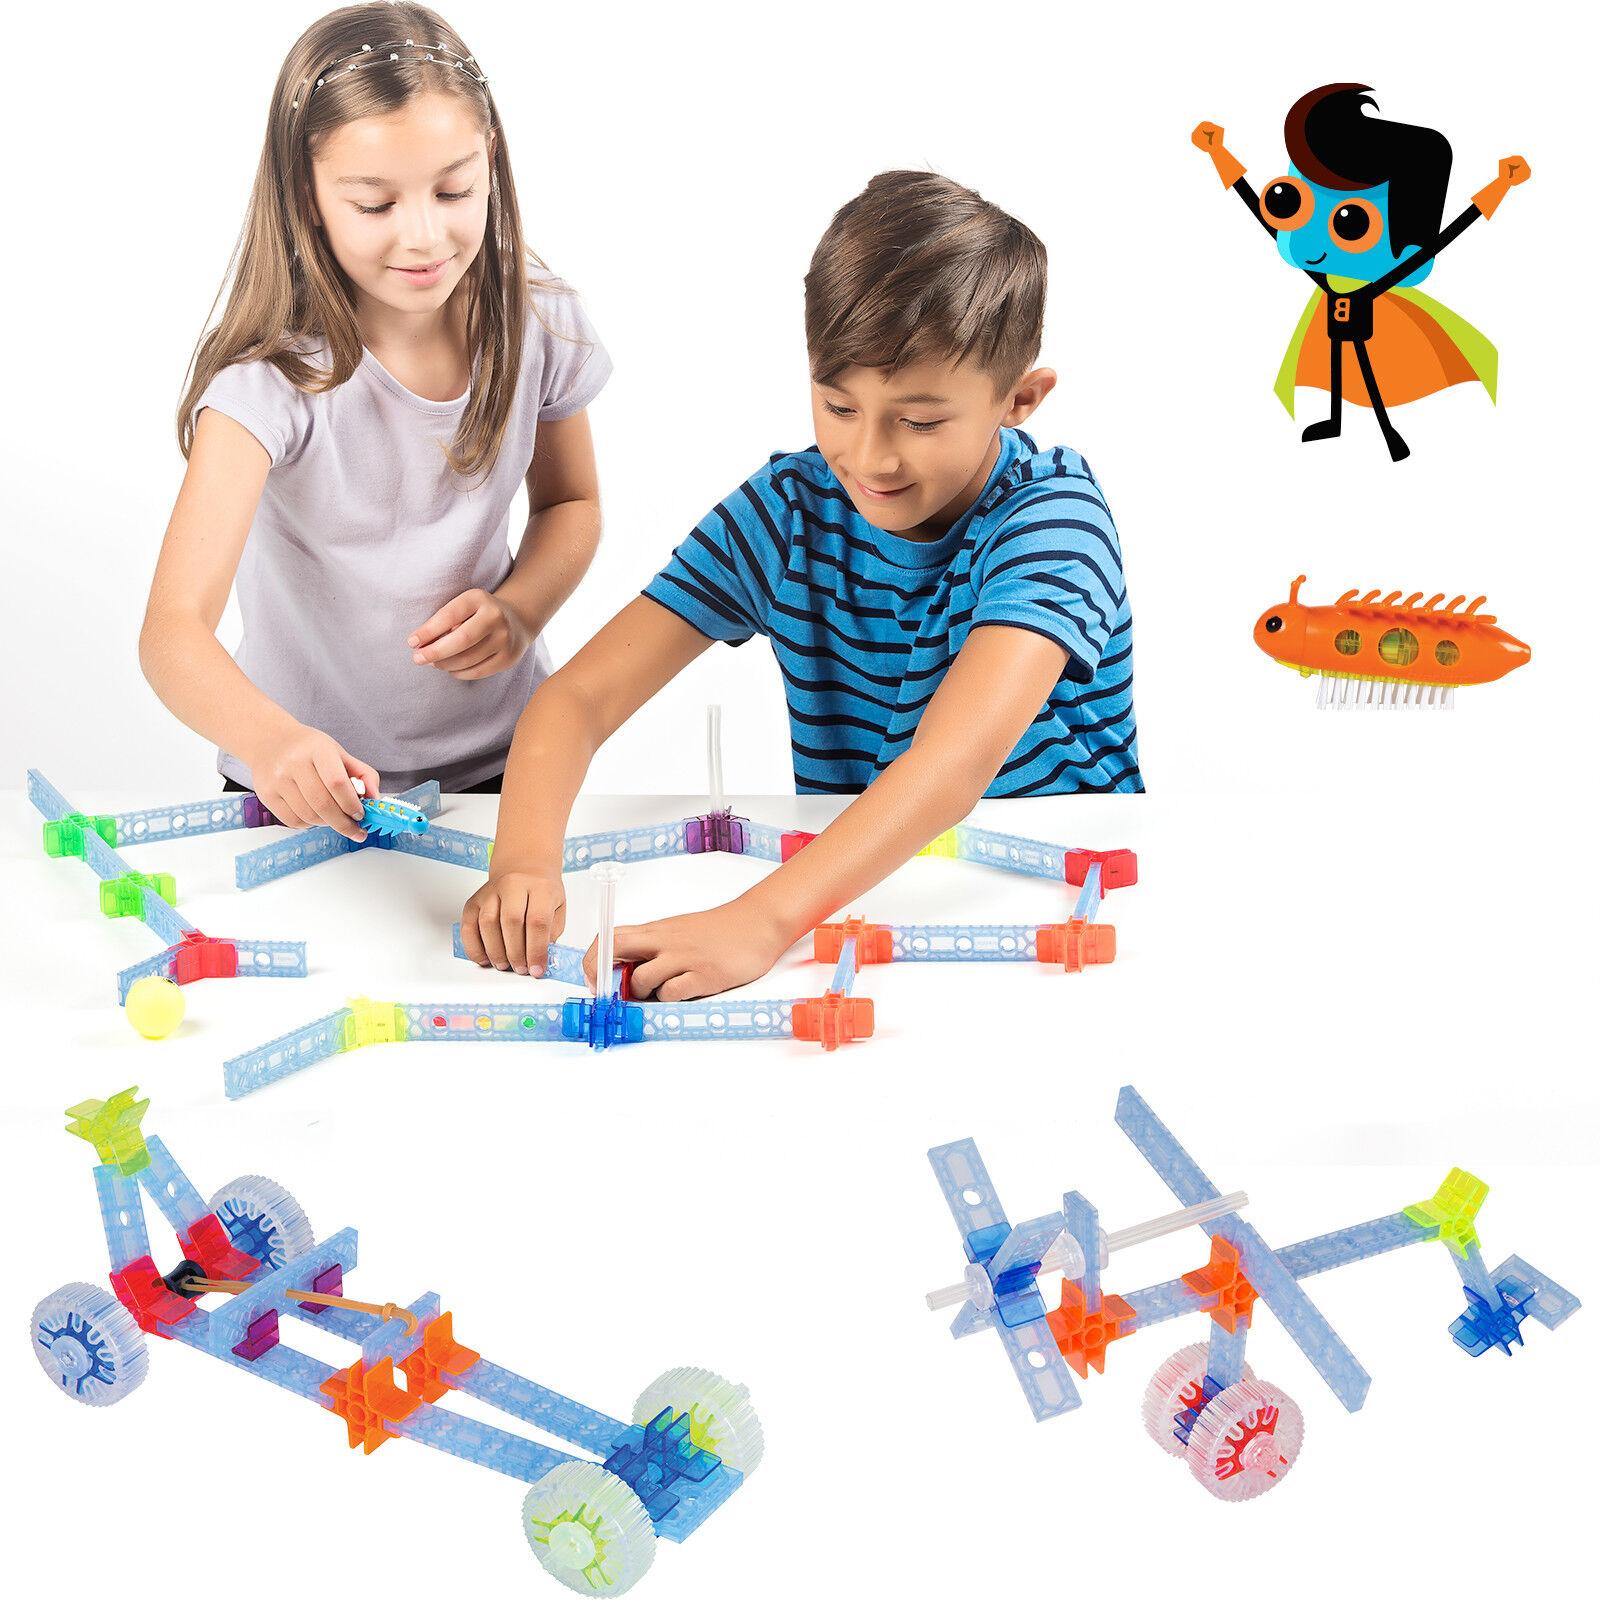 90-pc-brackitz-stem-hero-building-set-education-learning-fun-engineering-blocks